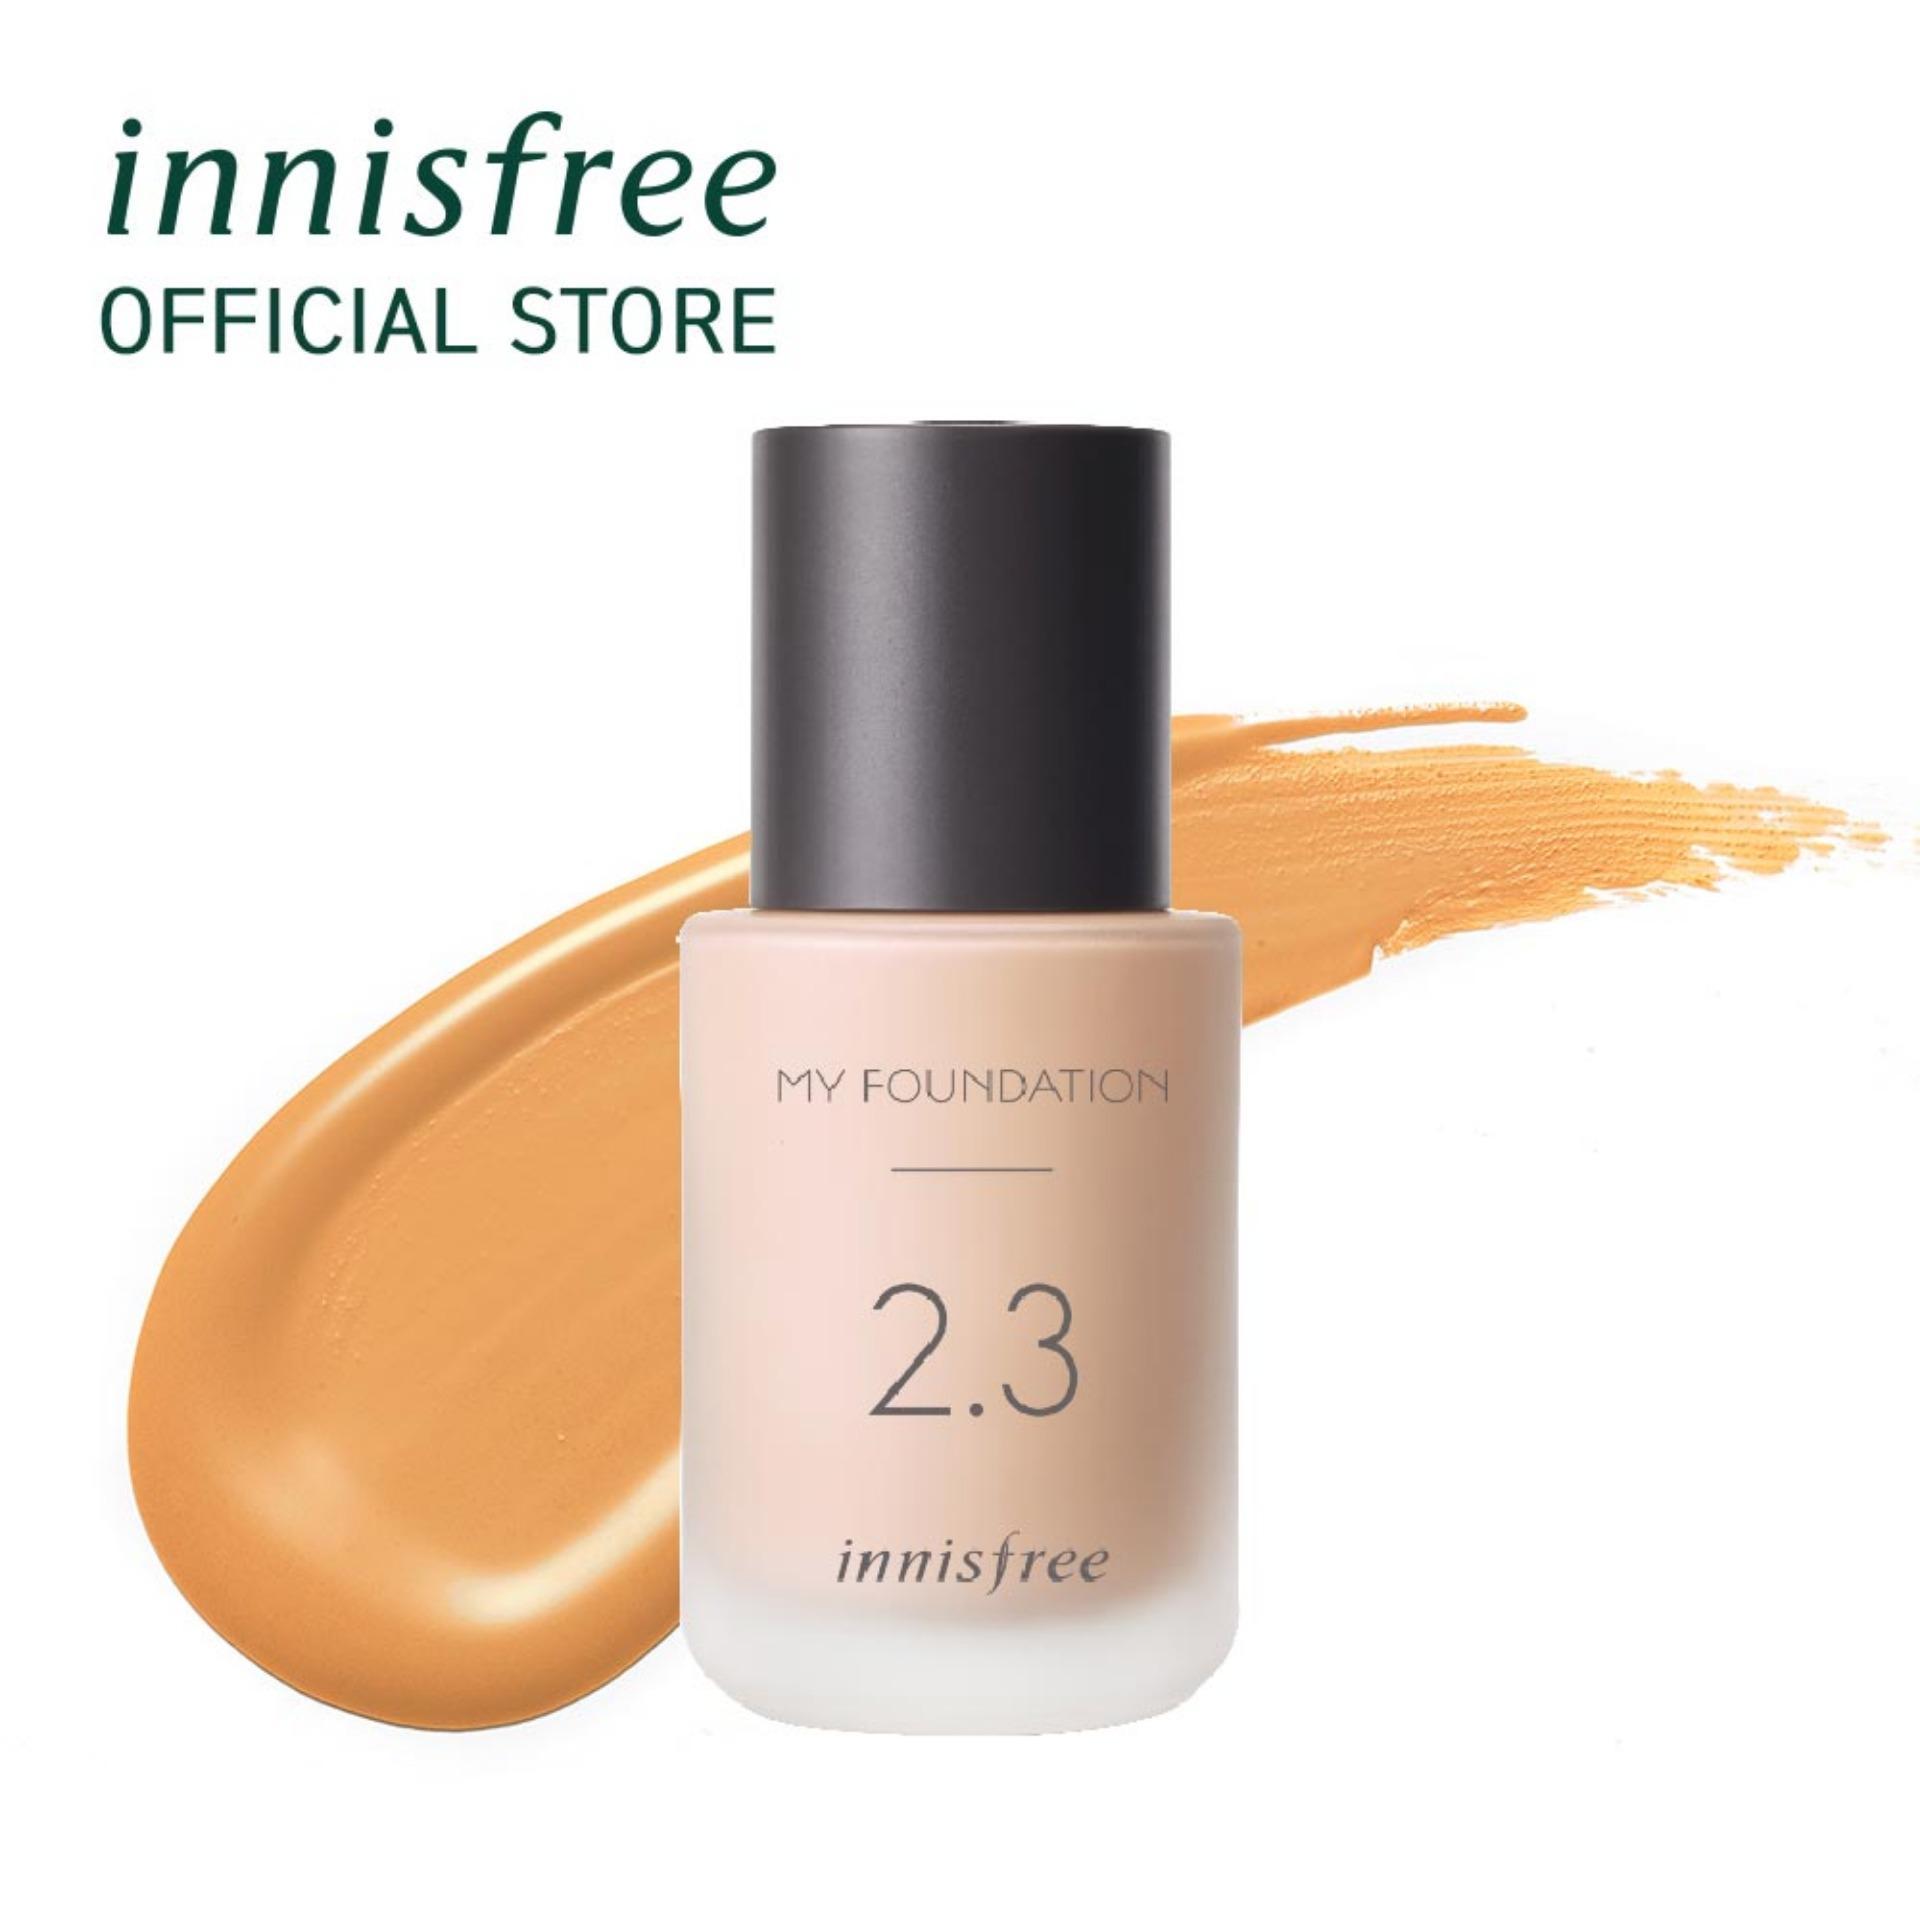 Innisfree My Foundation 2.3 30ml By Innisfree.